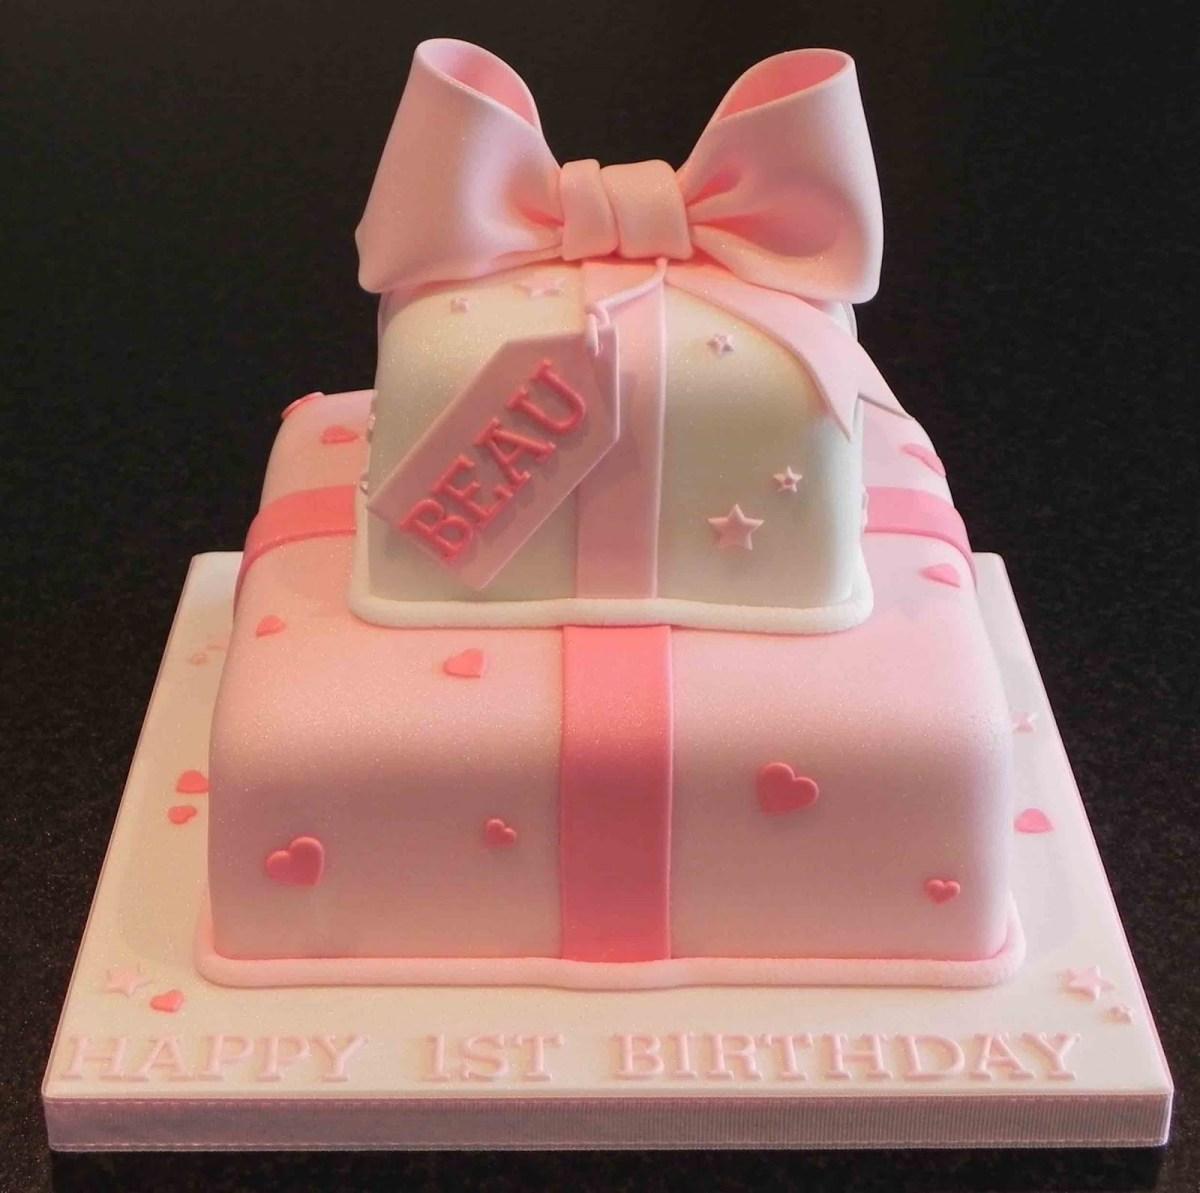 Birthday Cakes For Ladies Girls First Birthday Cake Ideas 1323 Wedding Academy Creative